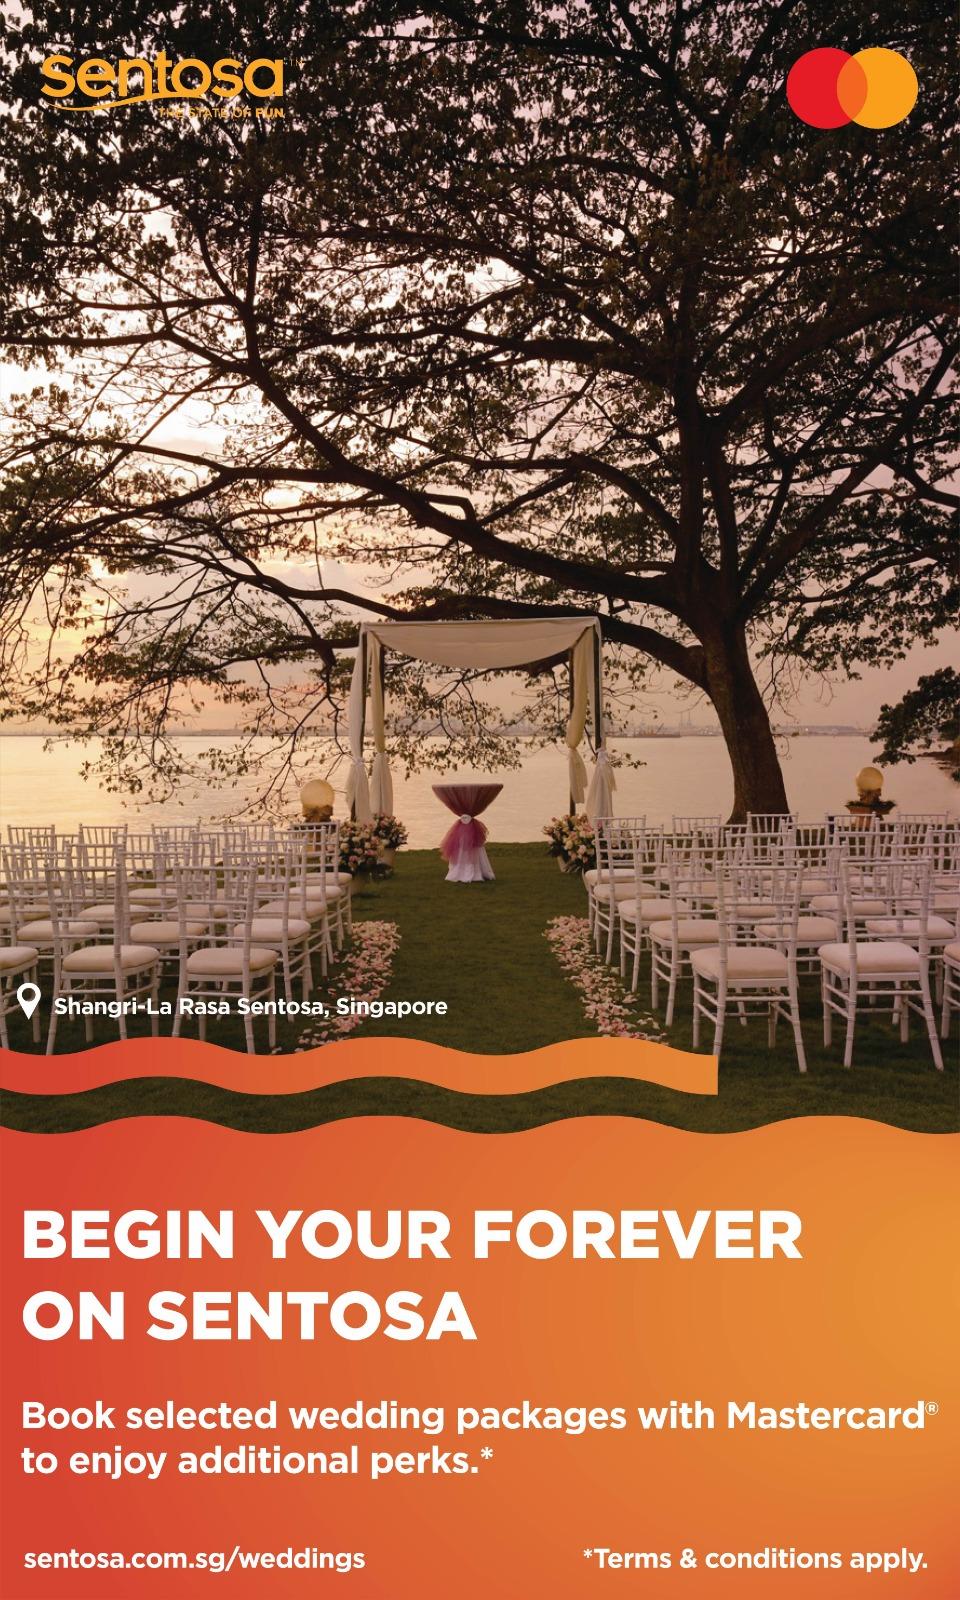 Sentosa Weddings